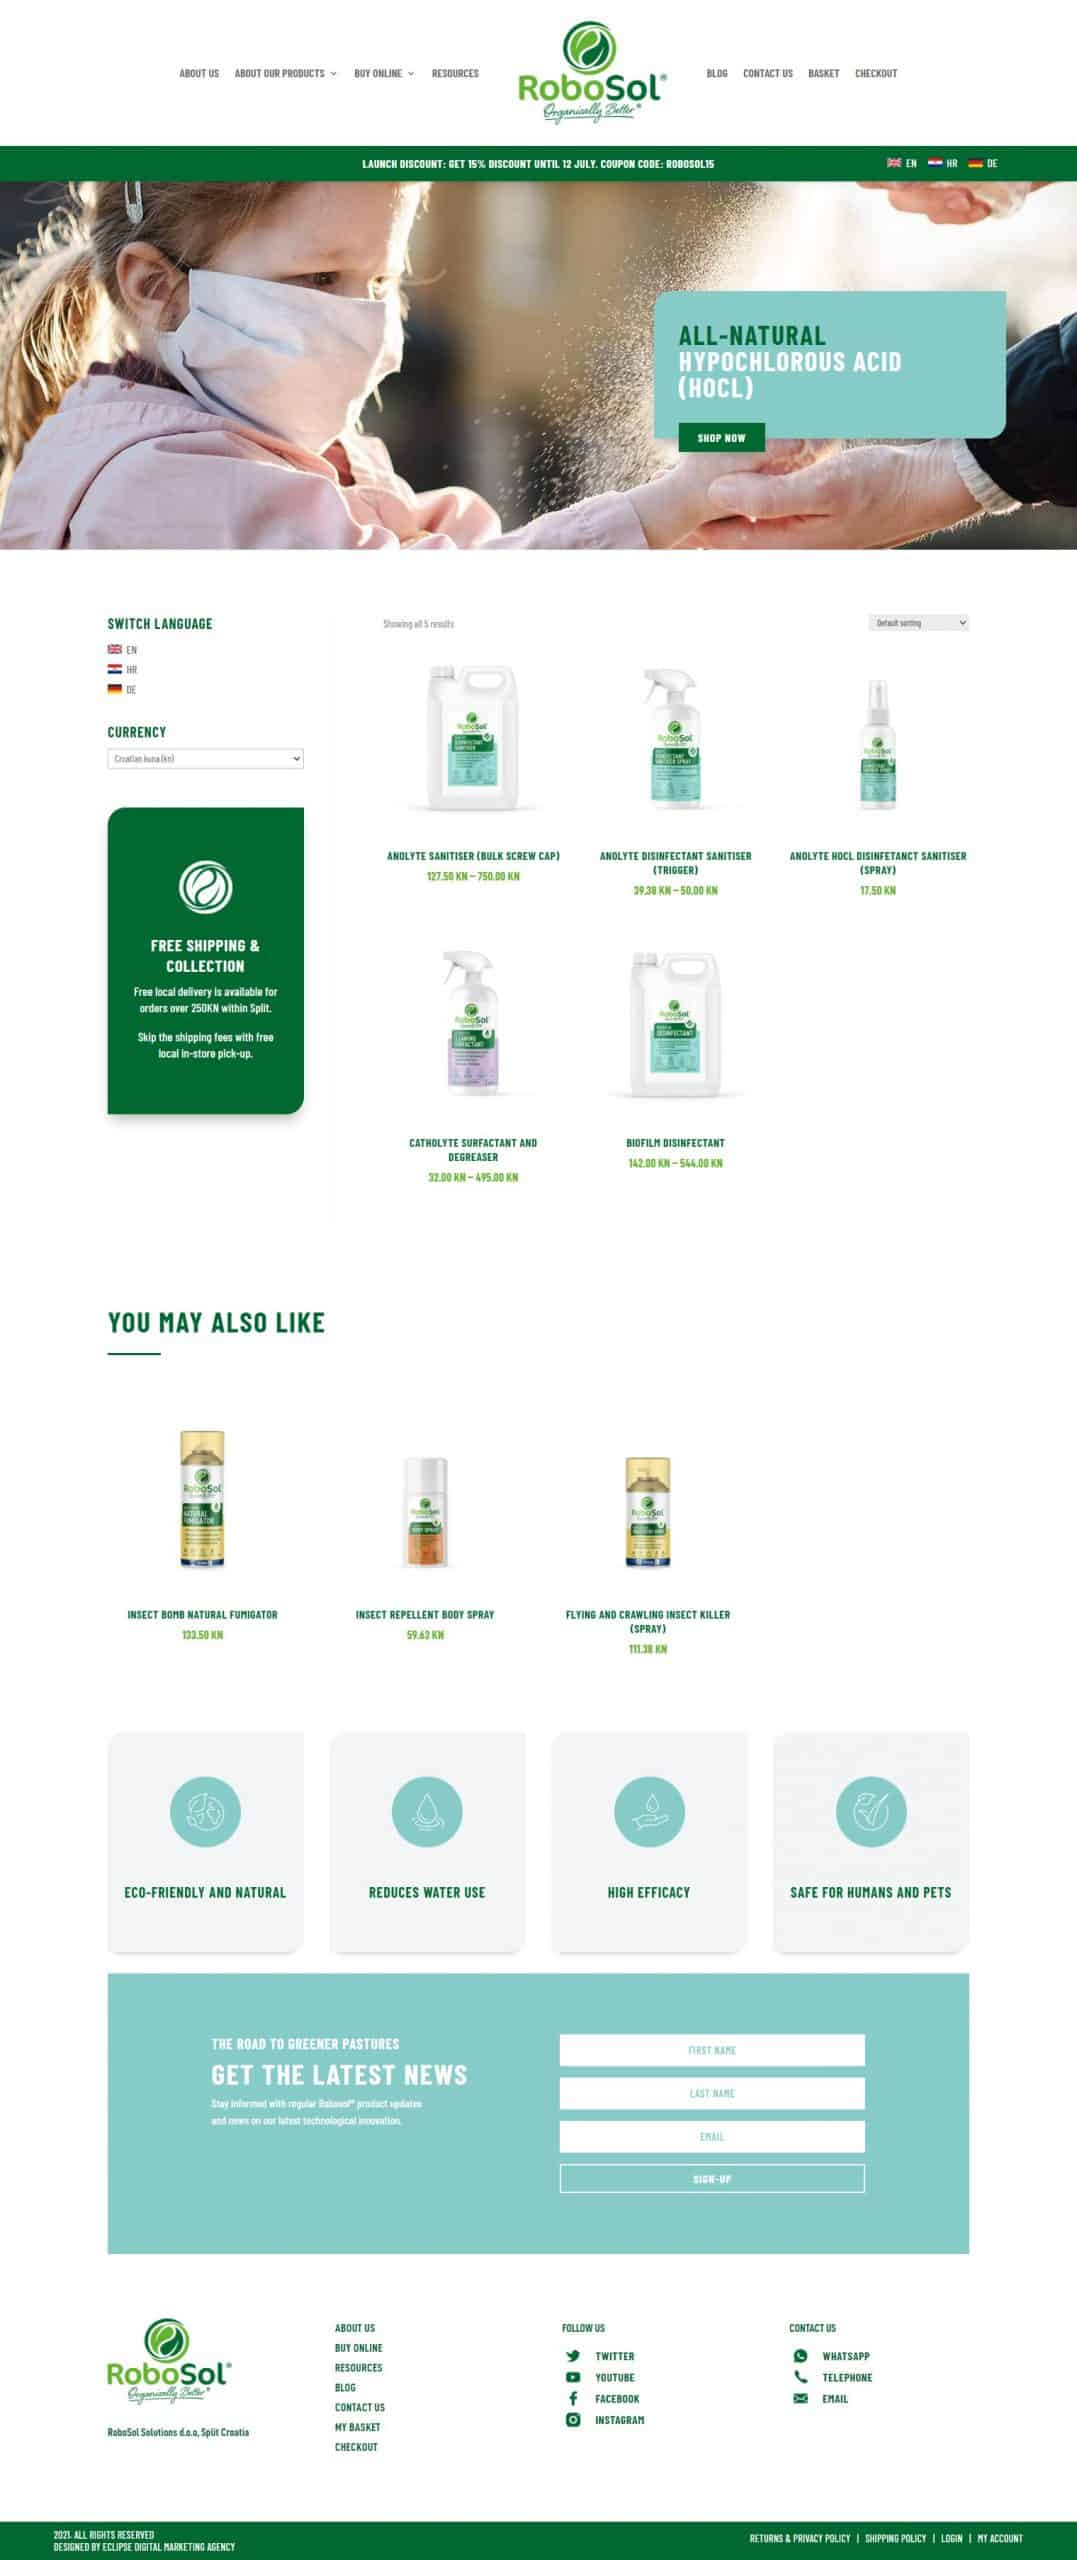 Eclipse Digital Marketing Agency - RoboSol Shop Page